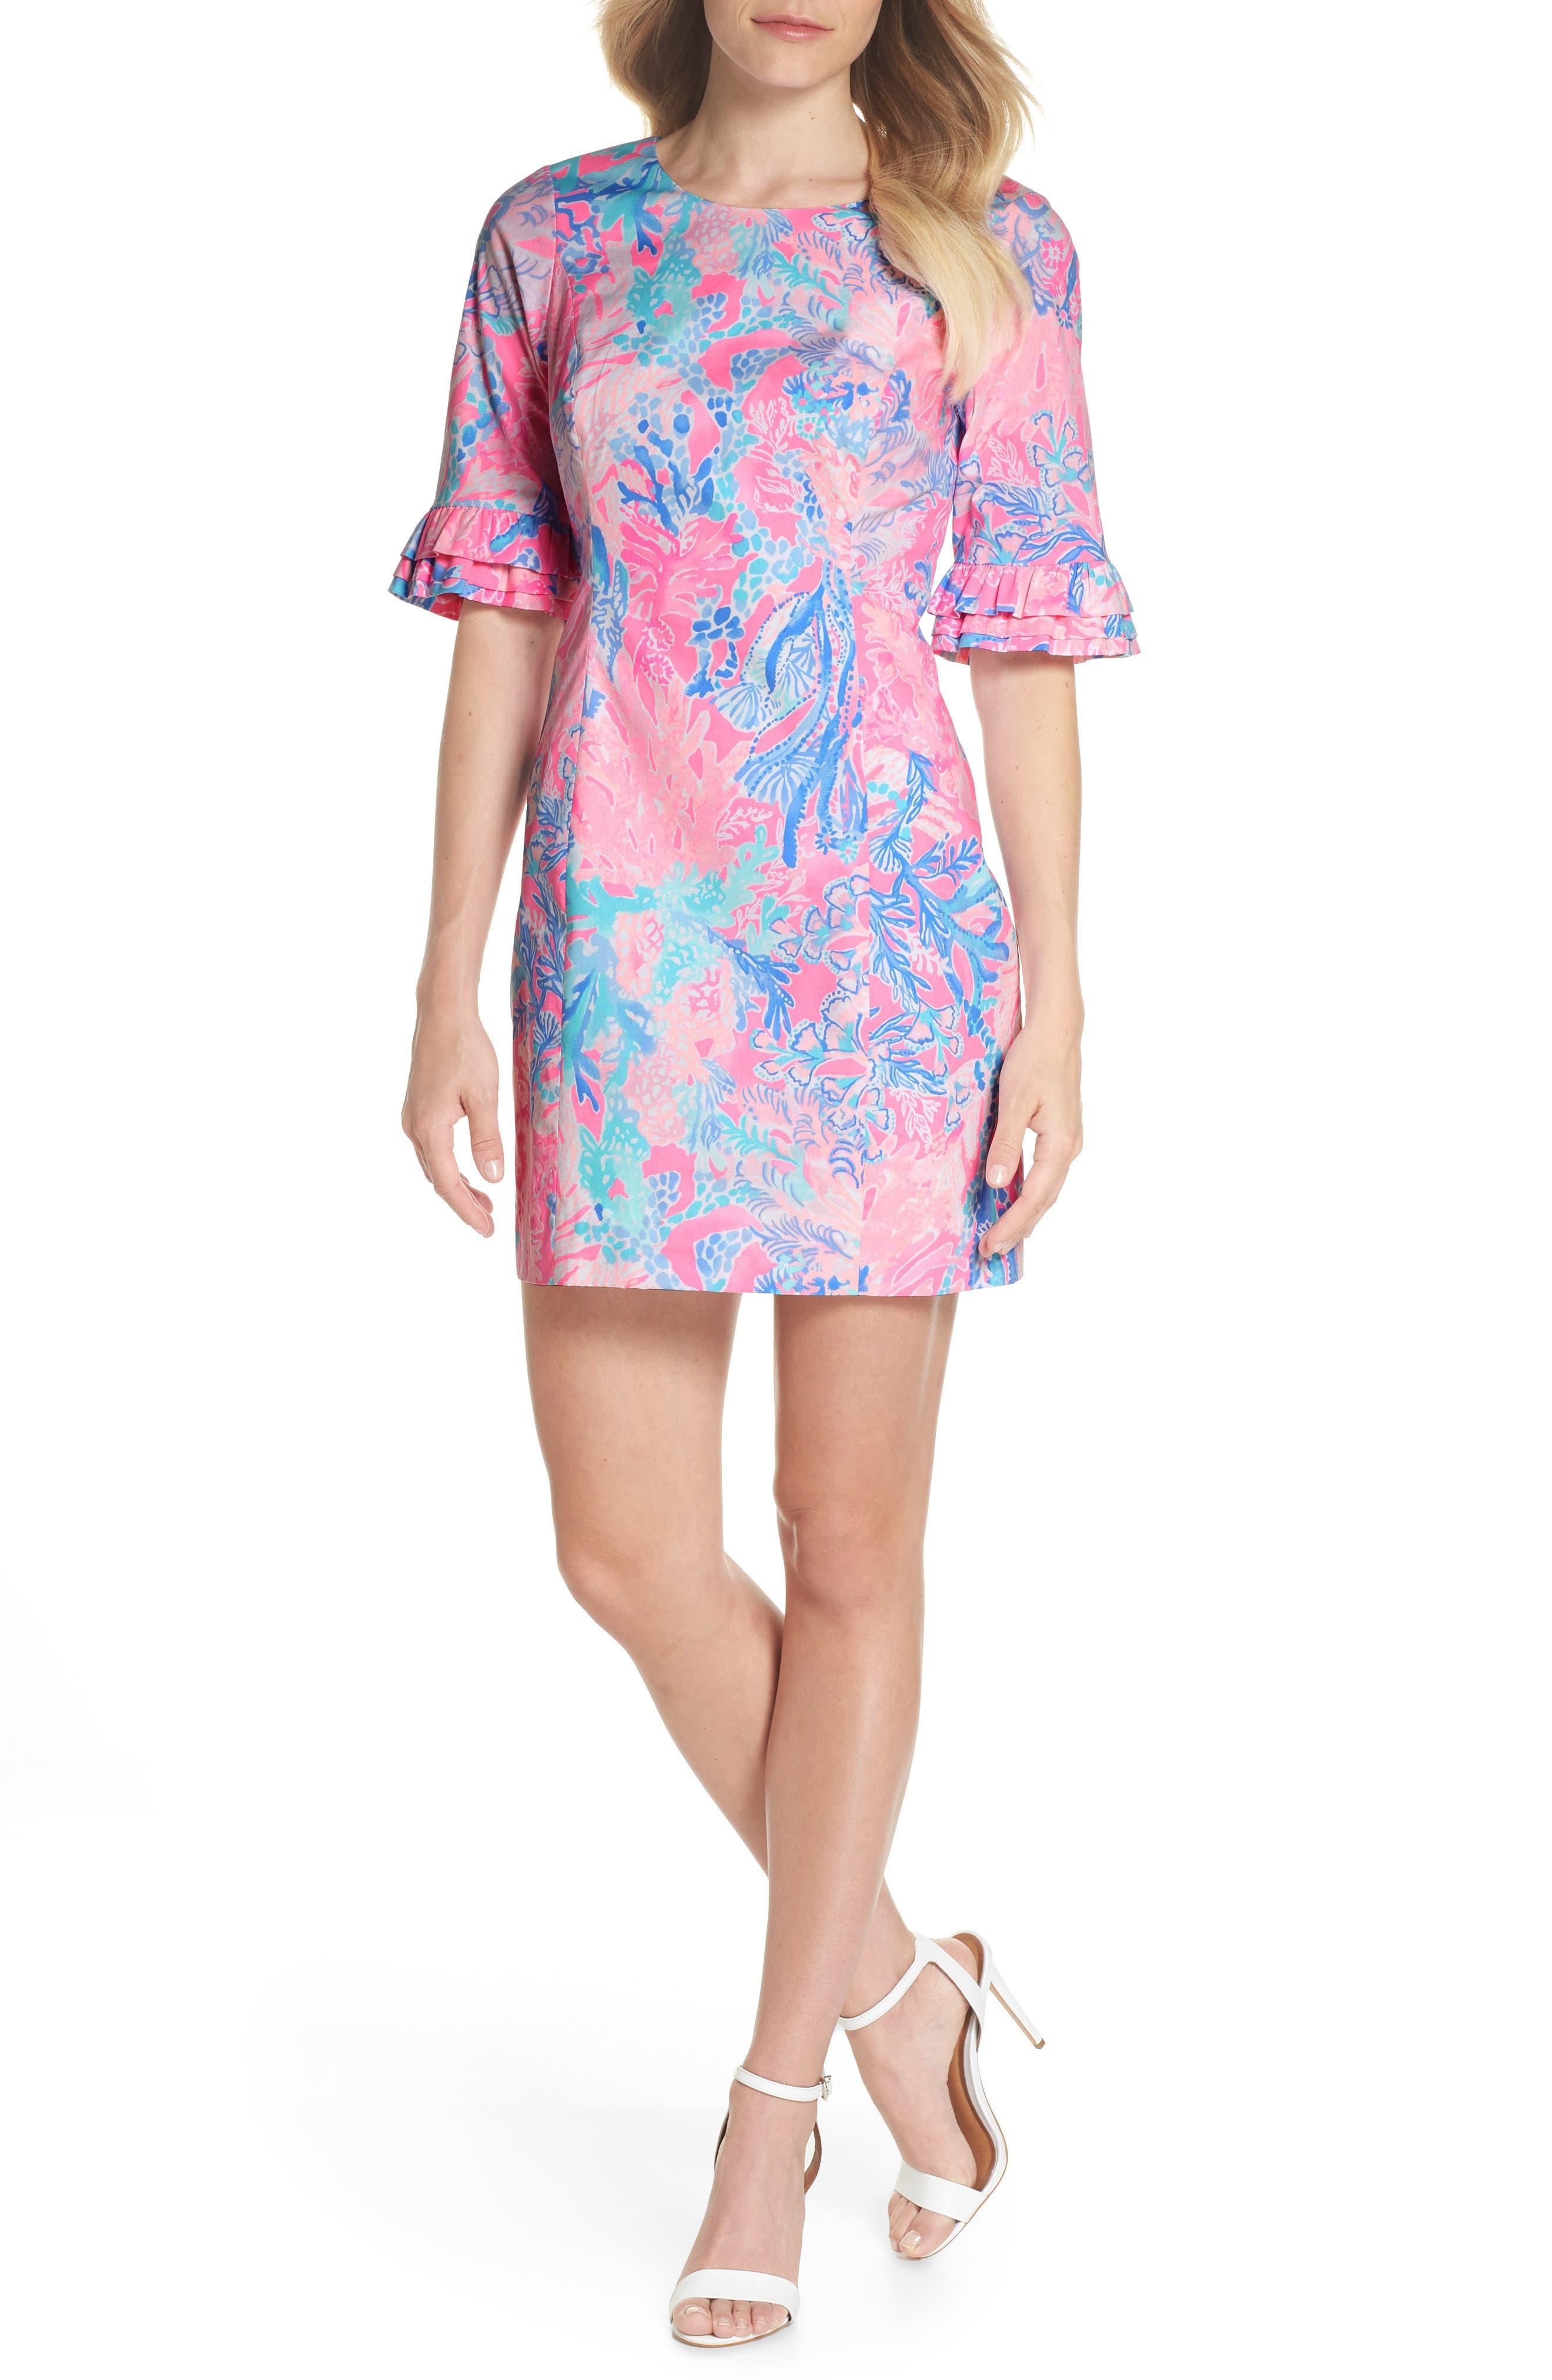 Fiesta Stretch Sheath Dress,                             Main thumbnail 1, color,                             LIGHT PASCHA PINK AQUADESIAC